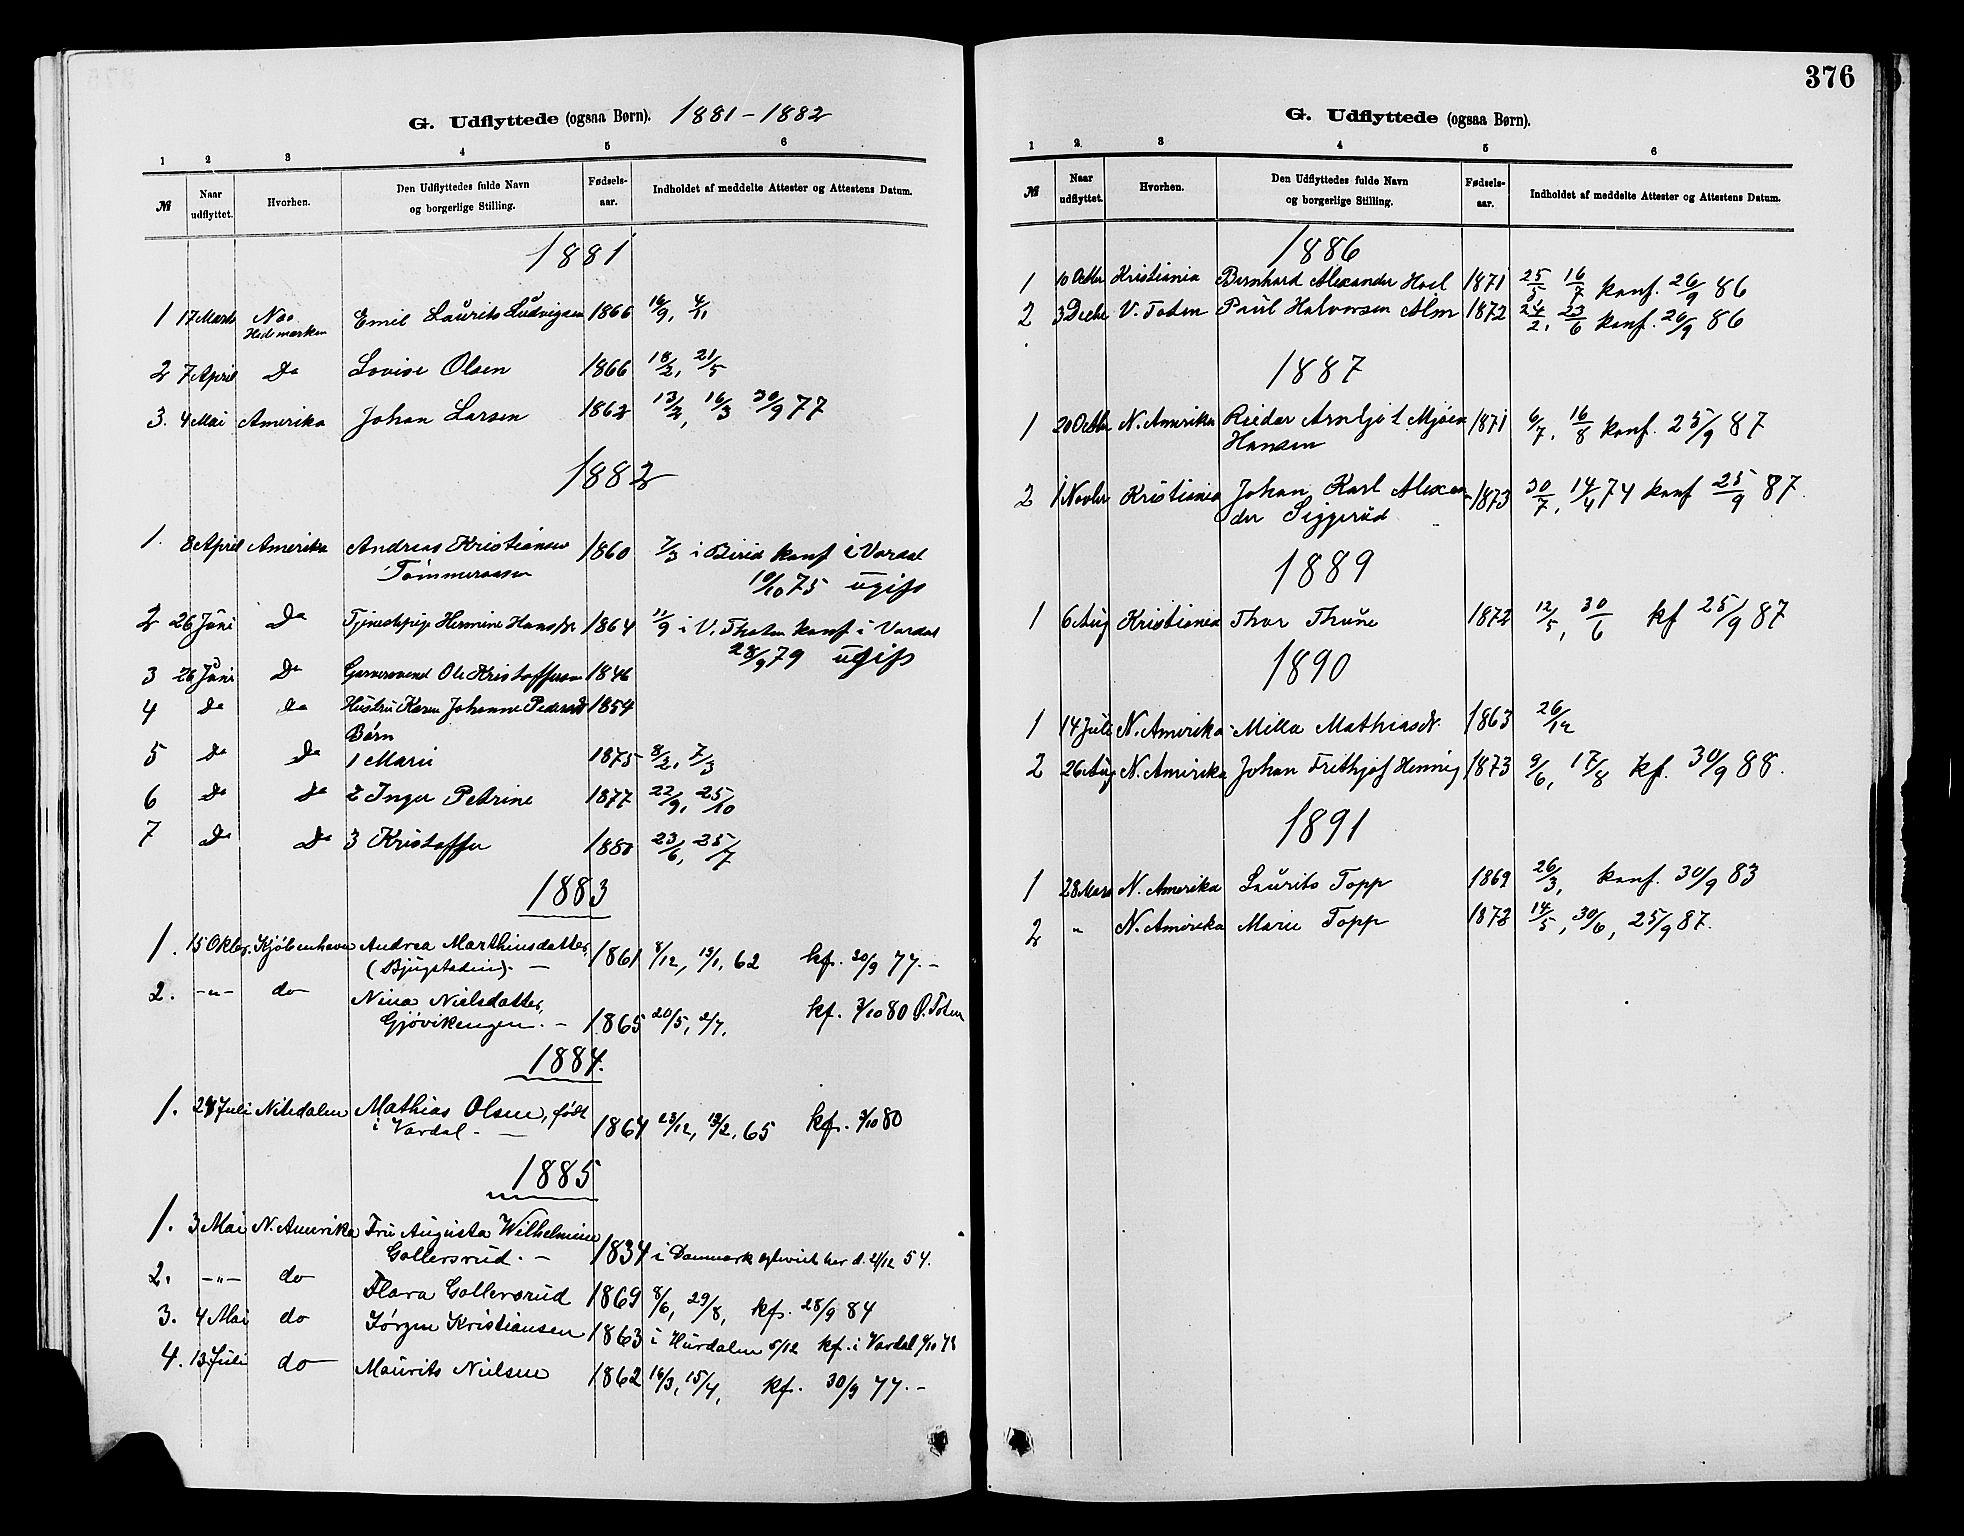 SAH, Vardal prestekontor, H/Ha/Hab/L0007: Klokkerbok nr. 7 /2, 1881-1895, s. 376